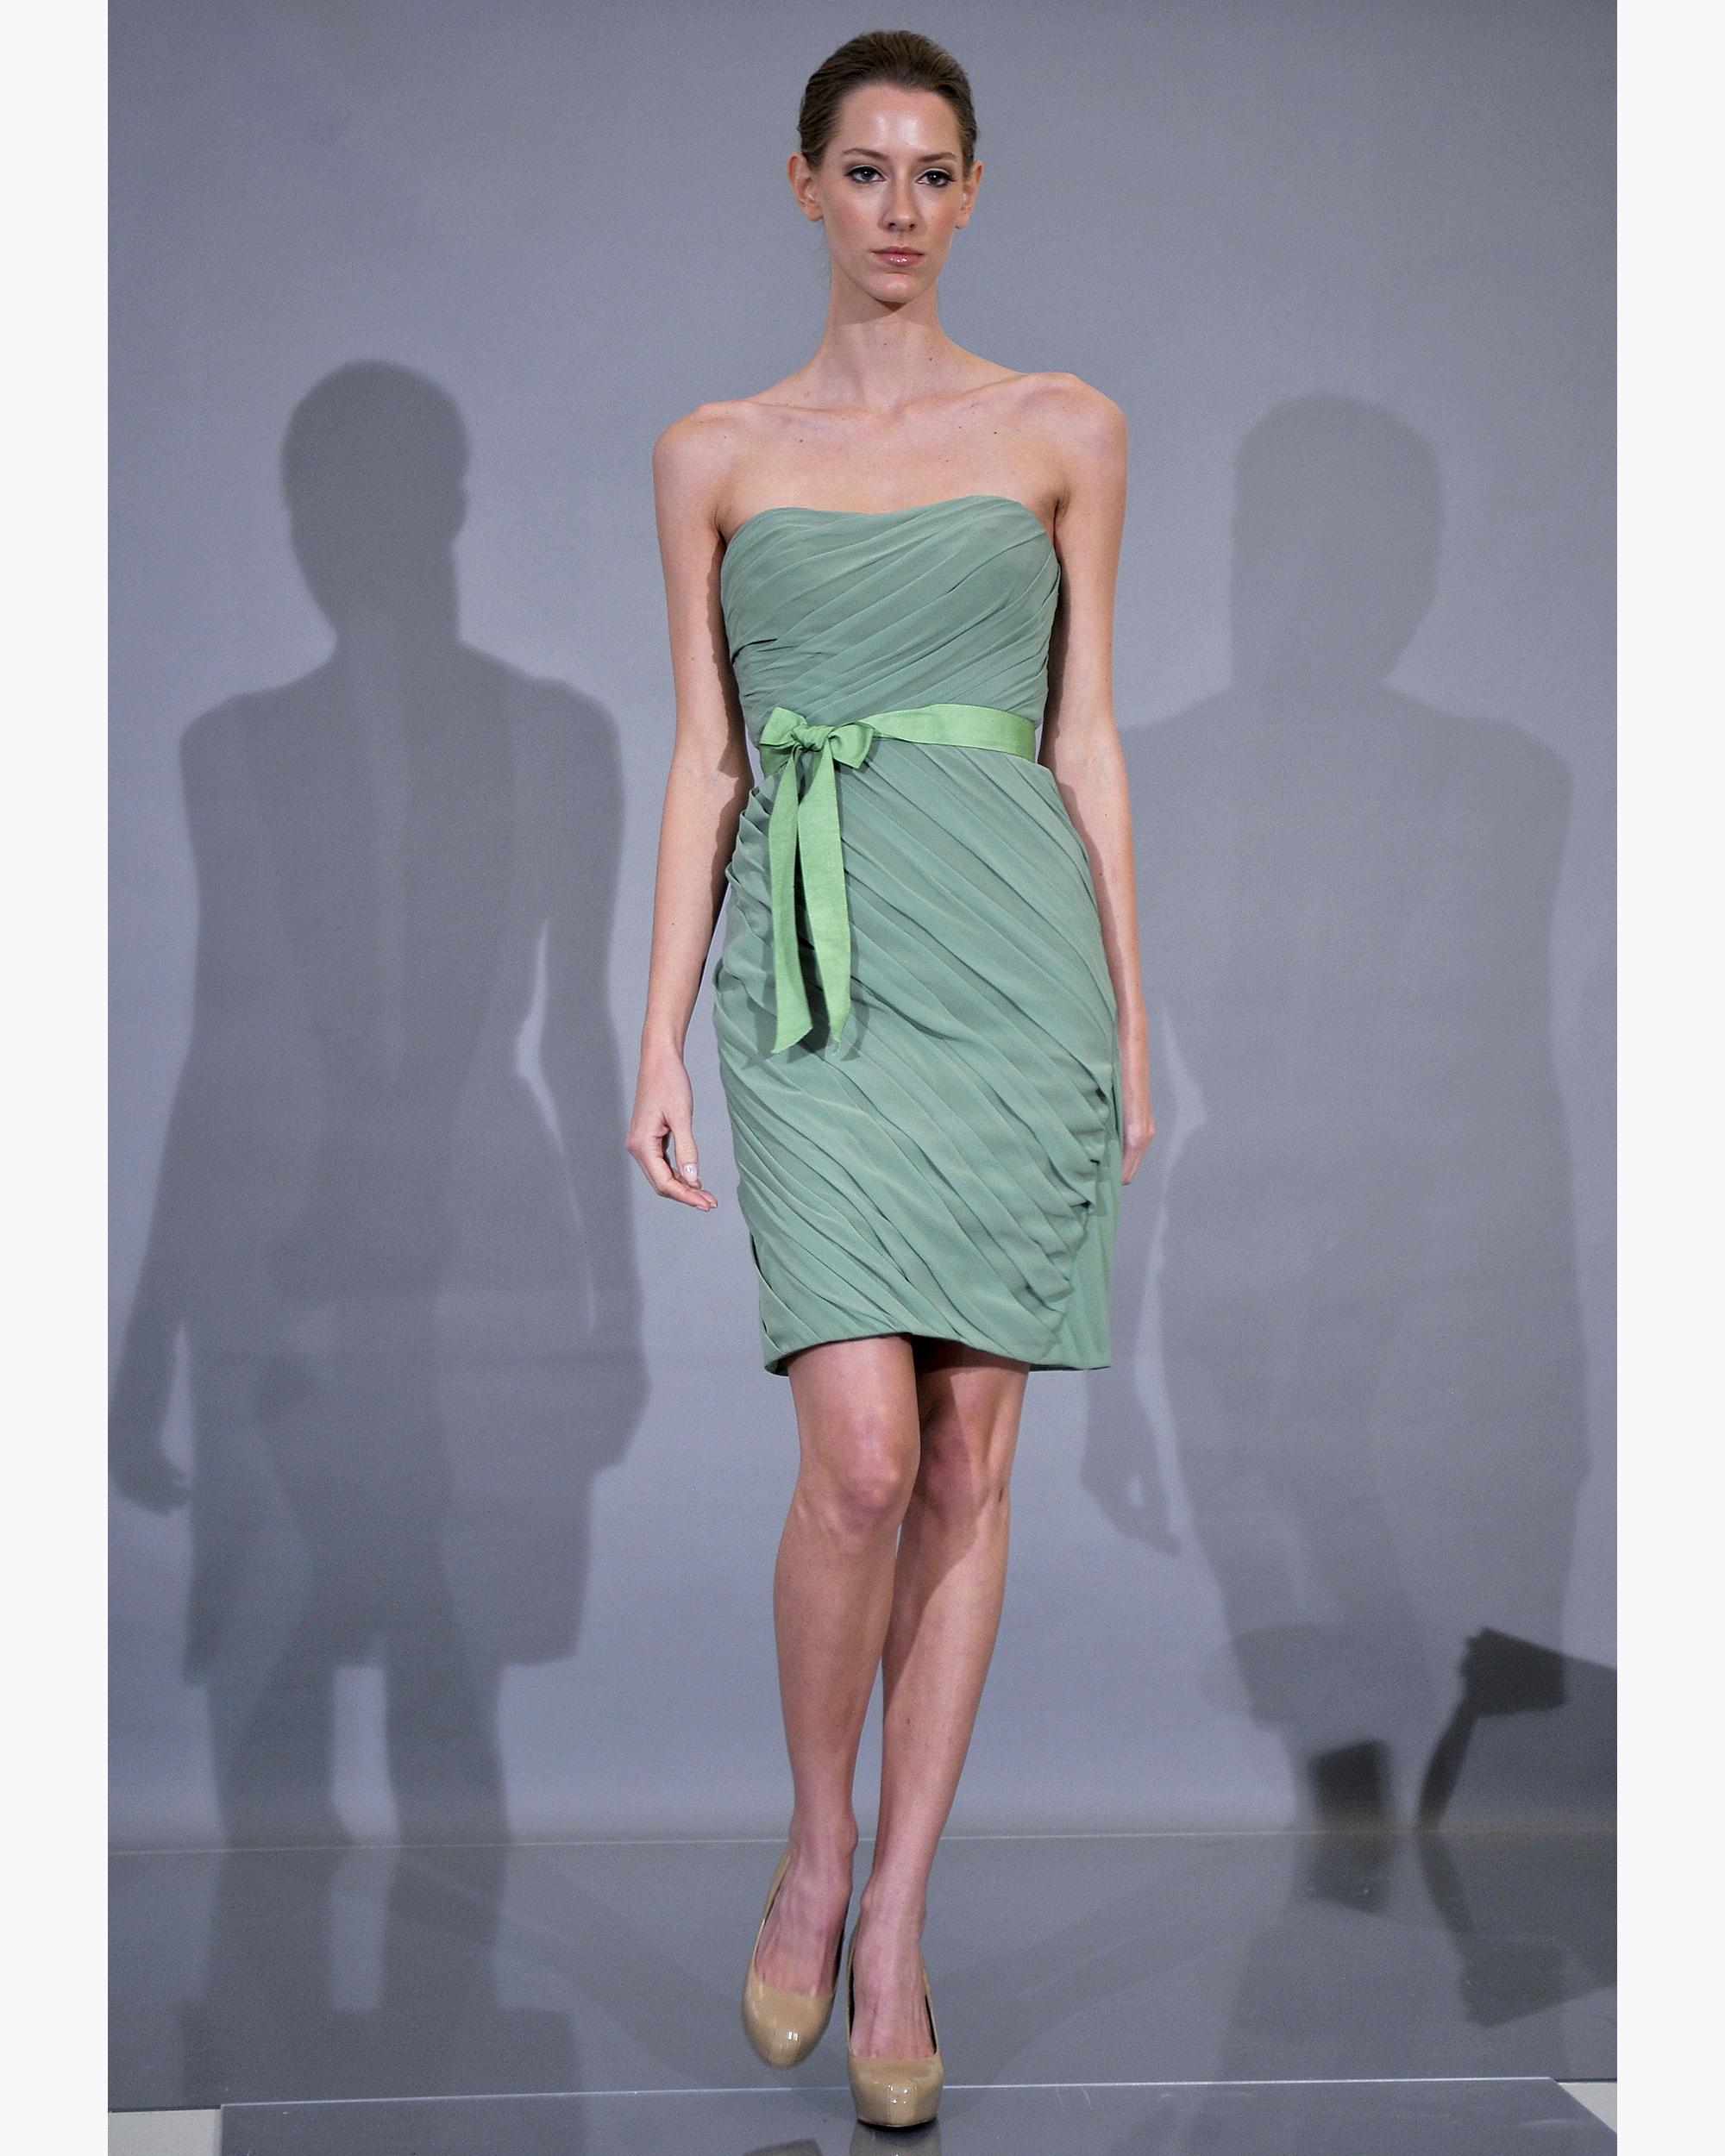 monique-lhuillier-bridesmaids-fall2012-wd108109-003.jpg